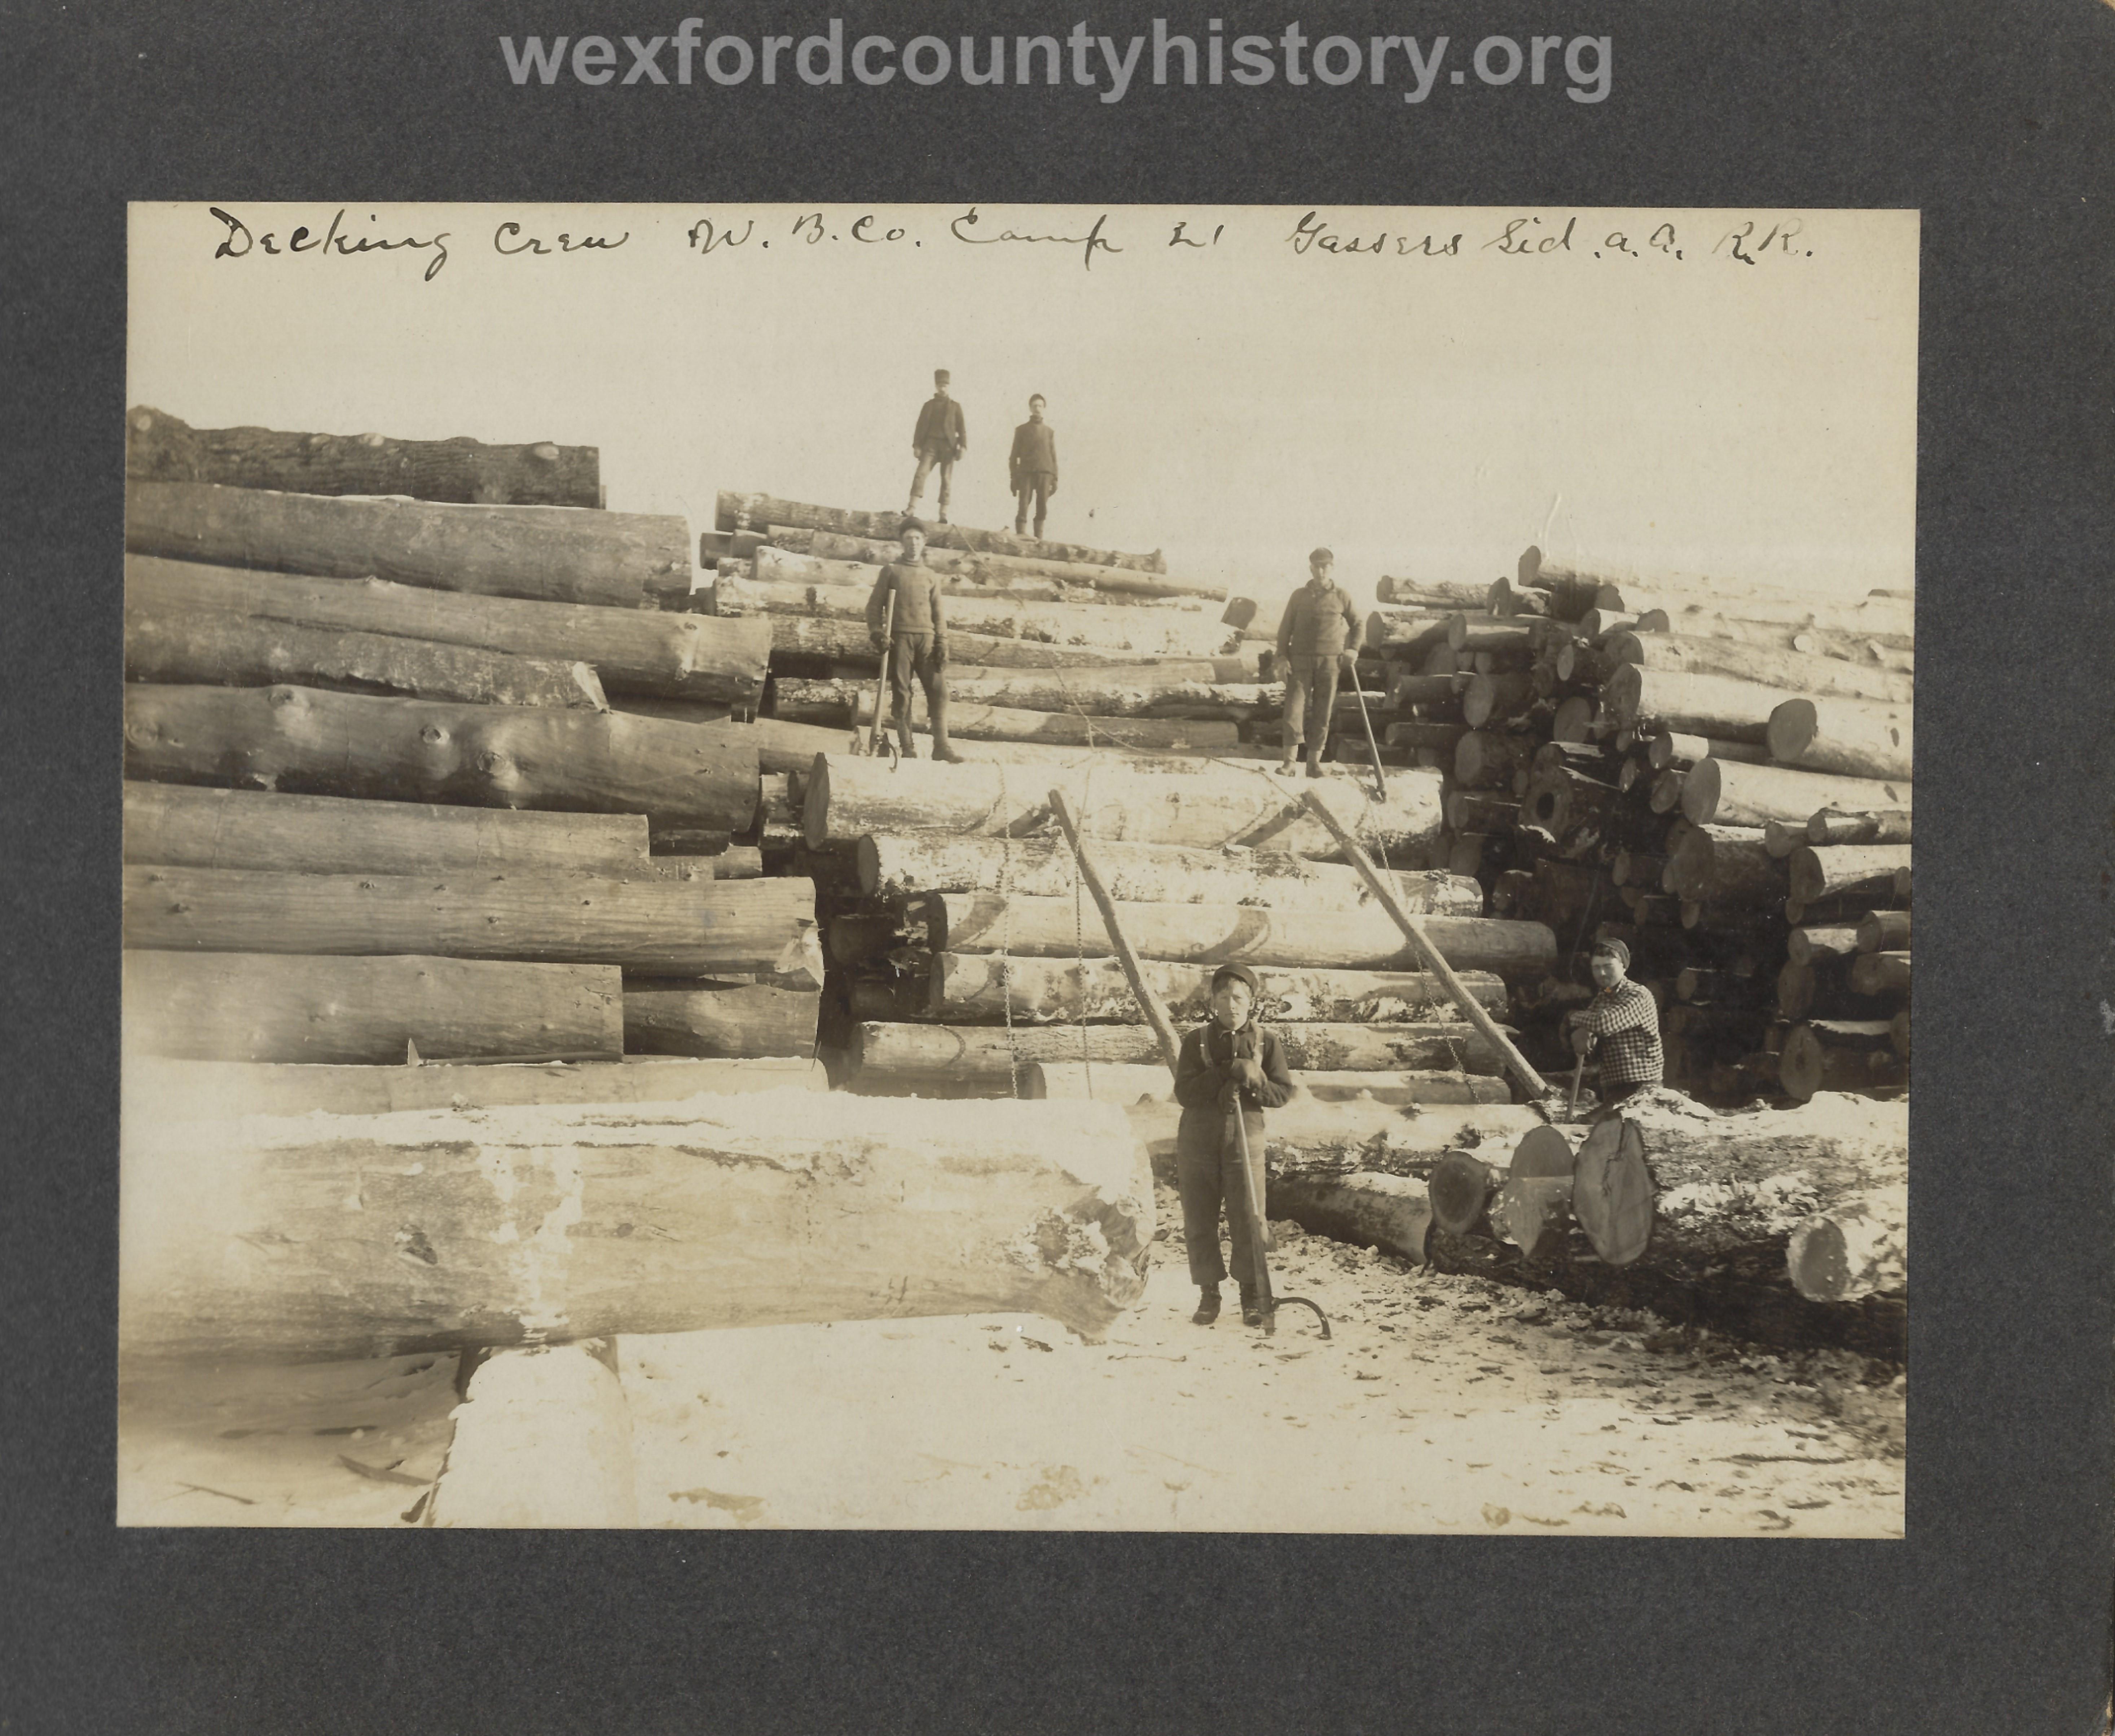 Cadillac-Lumber-Williams-Brothers-Company-Camp-Near-Harrietta-Decking-Crew